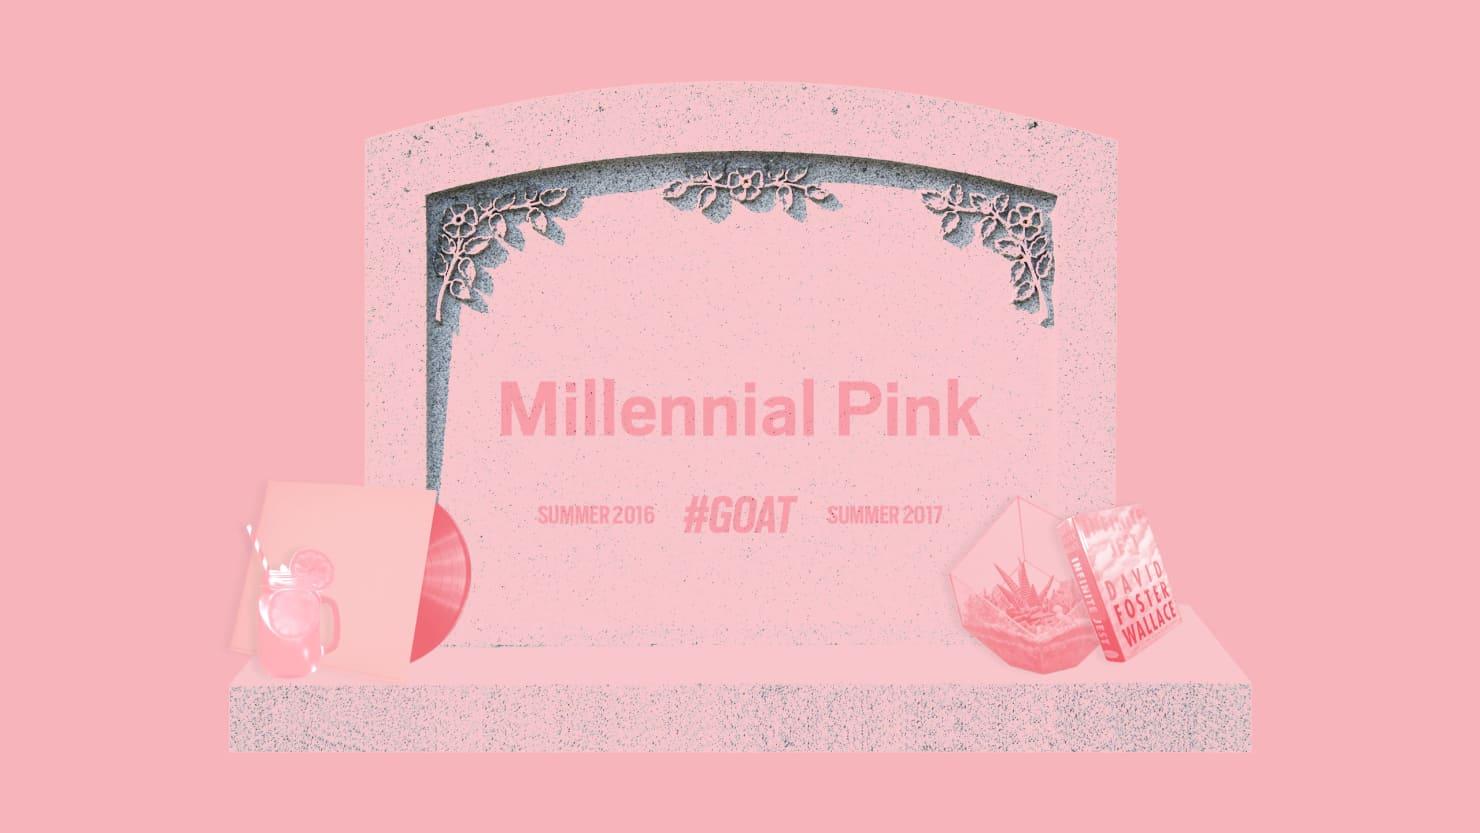 170618-crocker-millennial-pink-death-hero_pjgsxm.jpeg